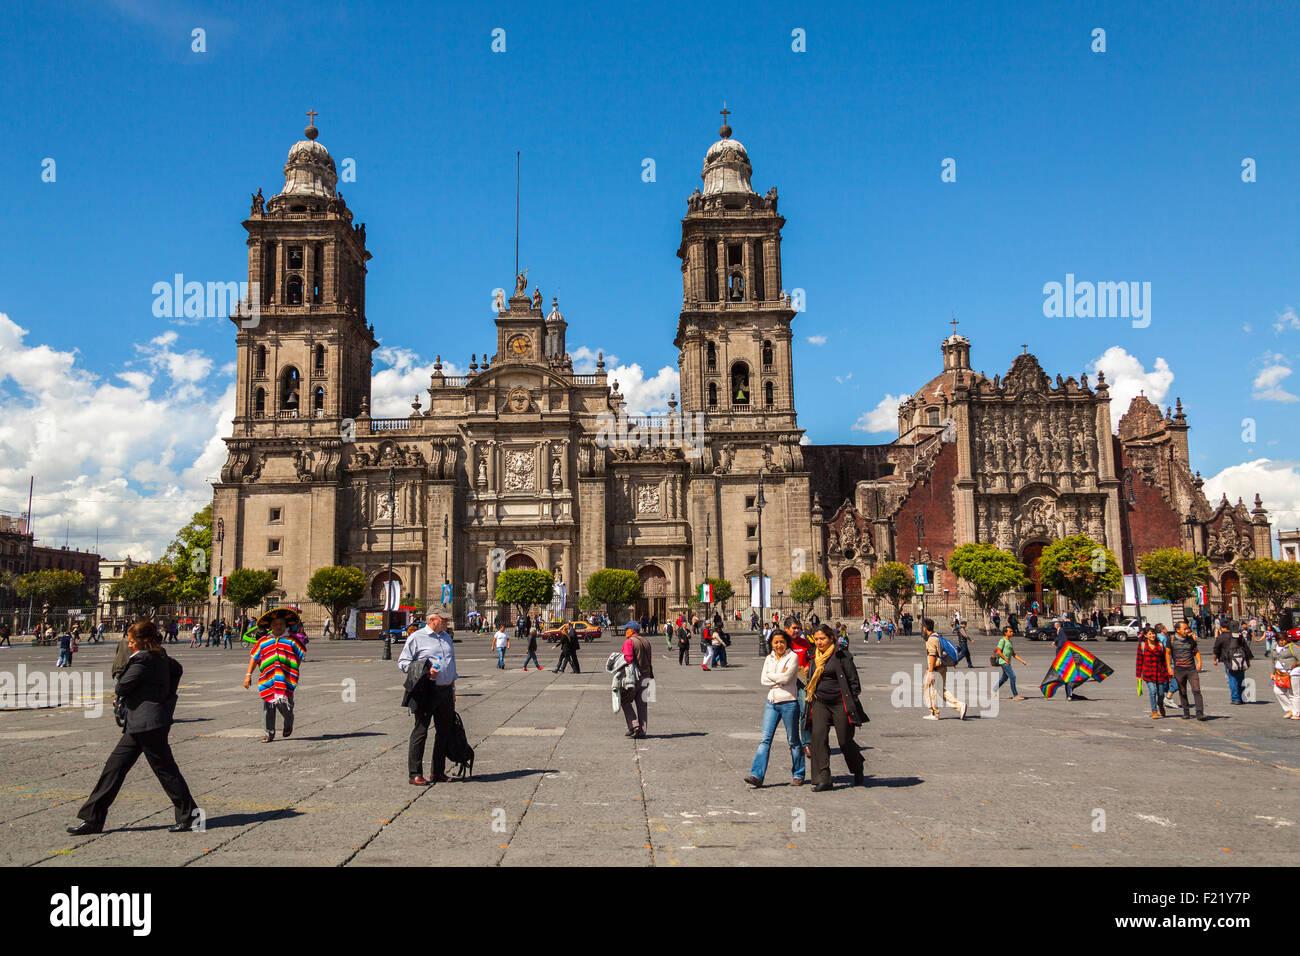 Metropolitan Cathedral Catedral Metropolitana Asuncion de Maria Plaza de la Constitucion Zocalo square Mexico City - Stock Image